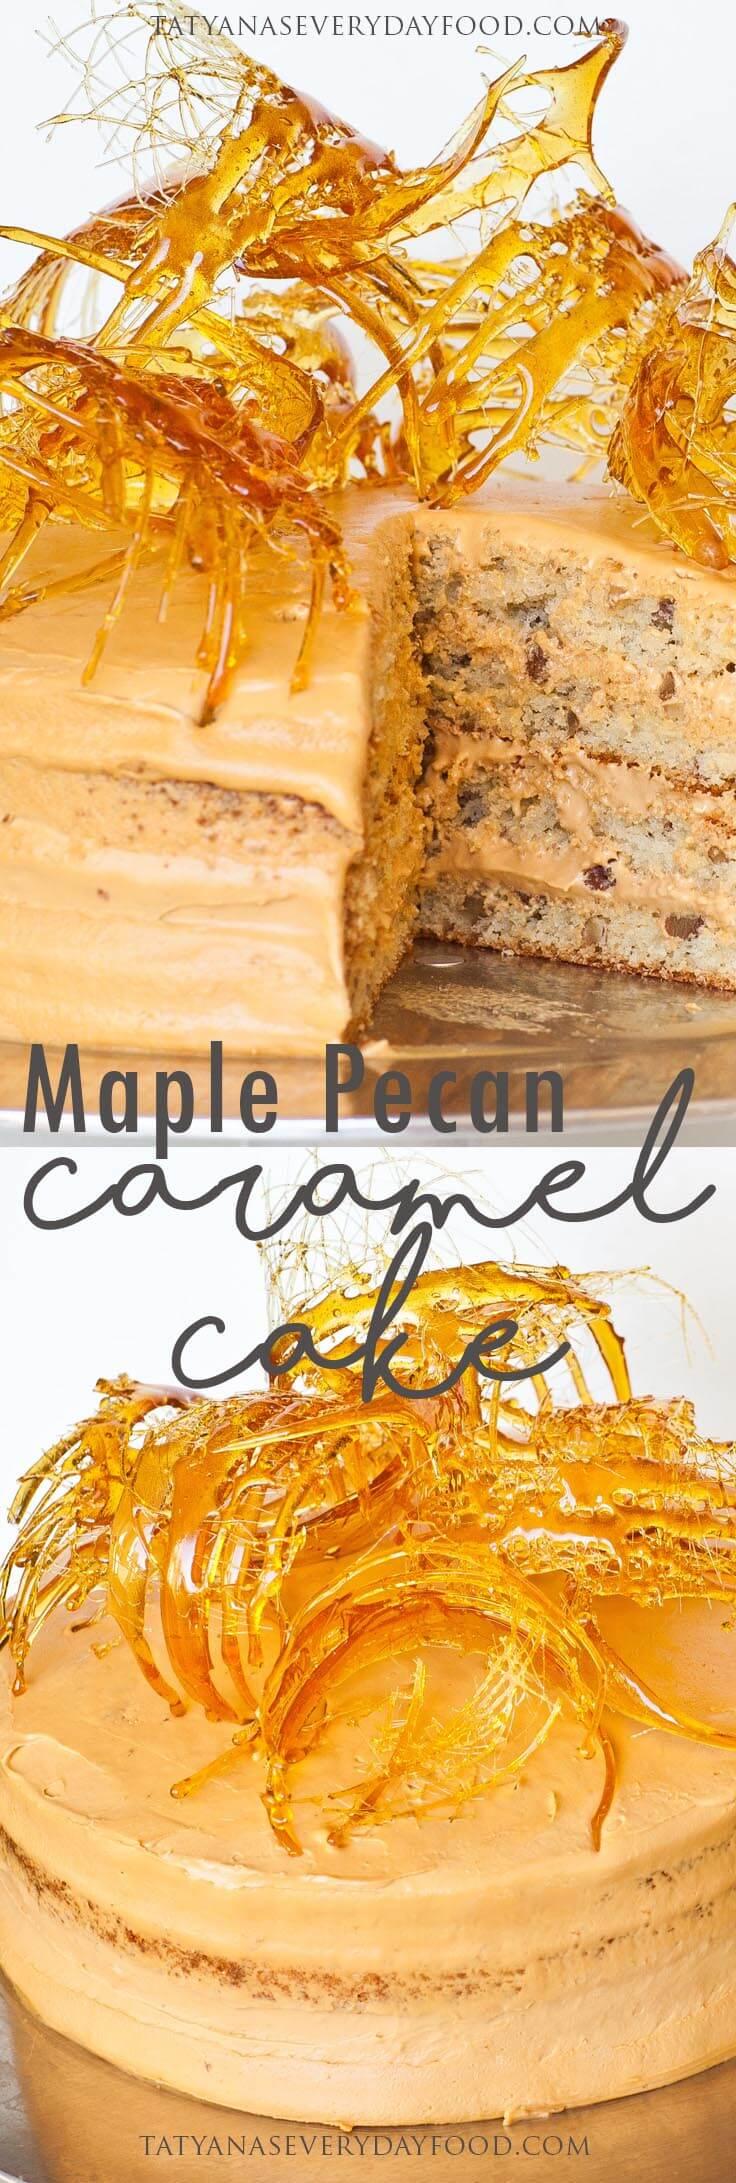 Maple Pecan Caramel Cake video recipe